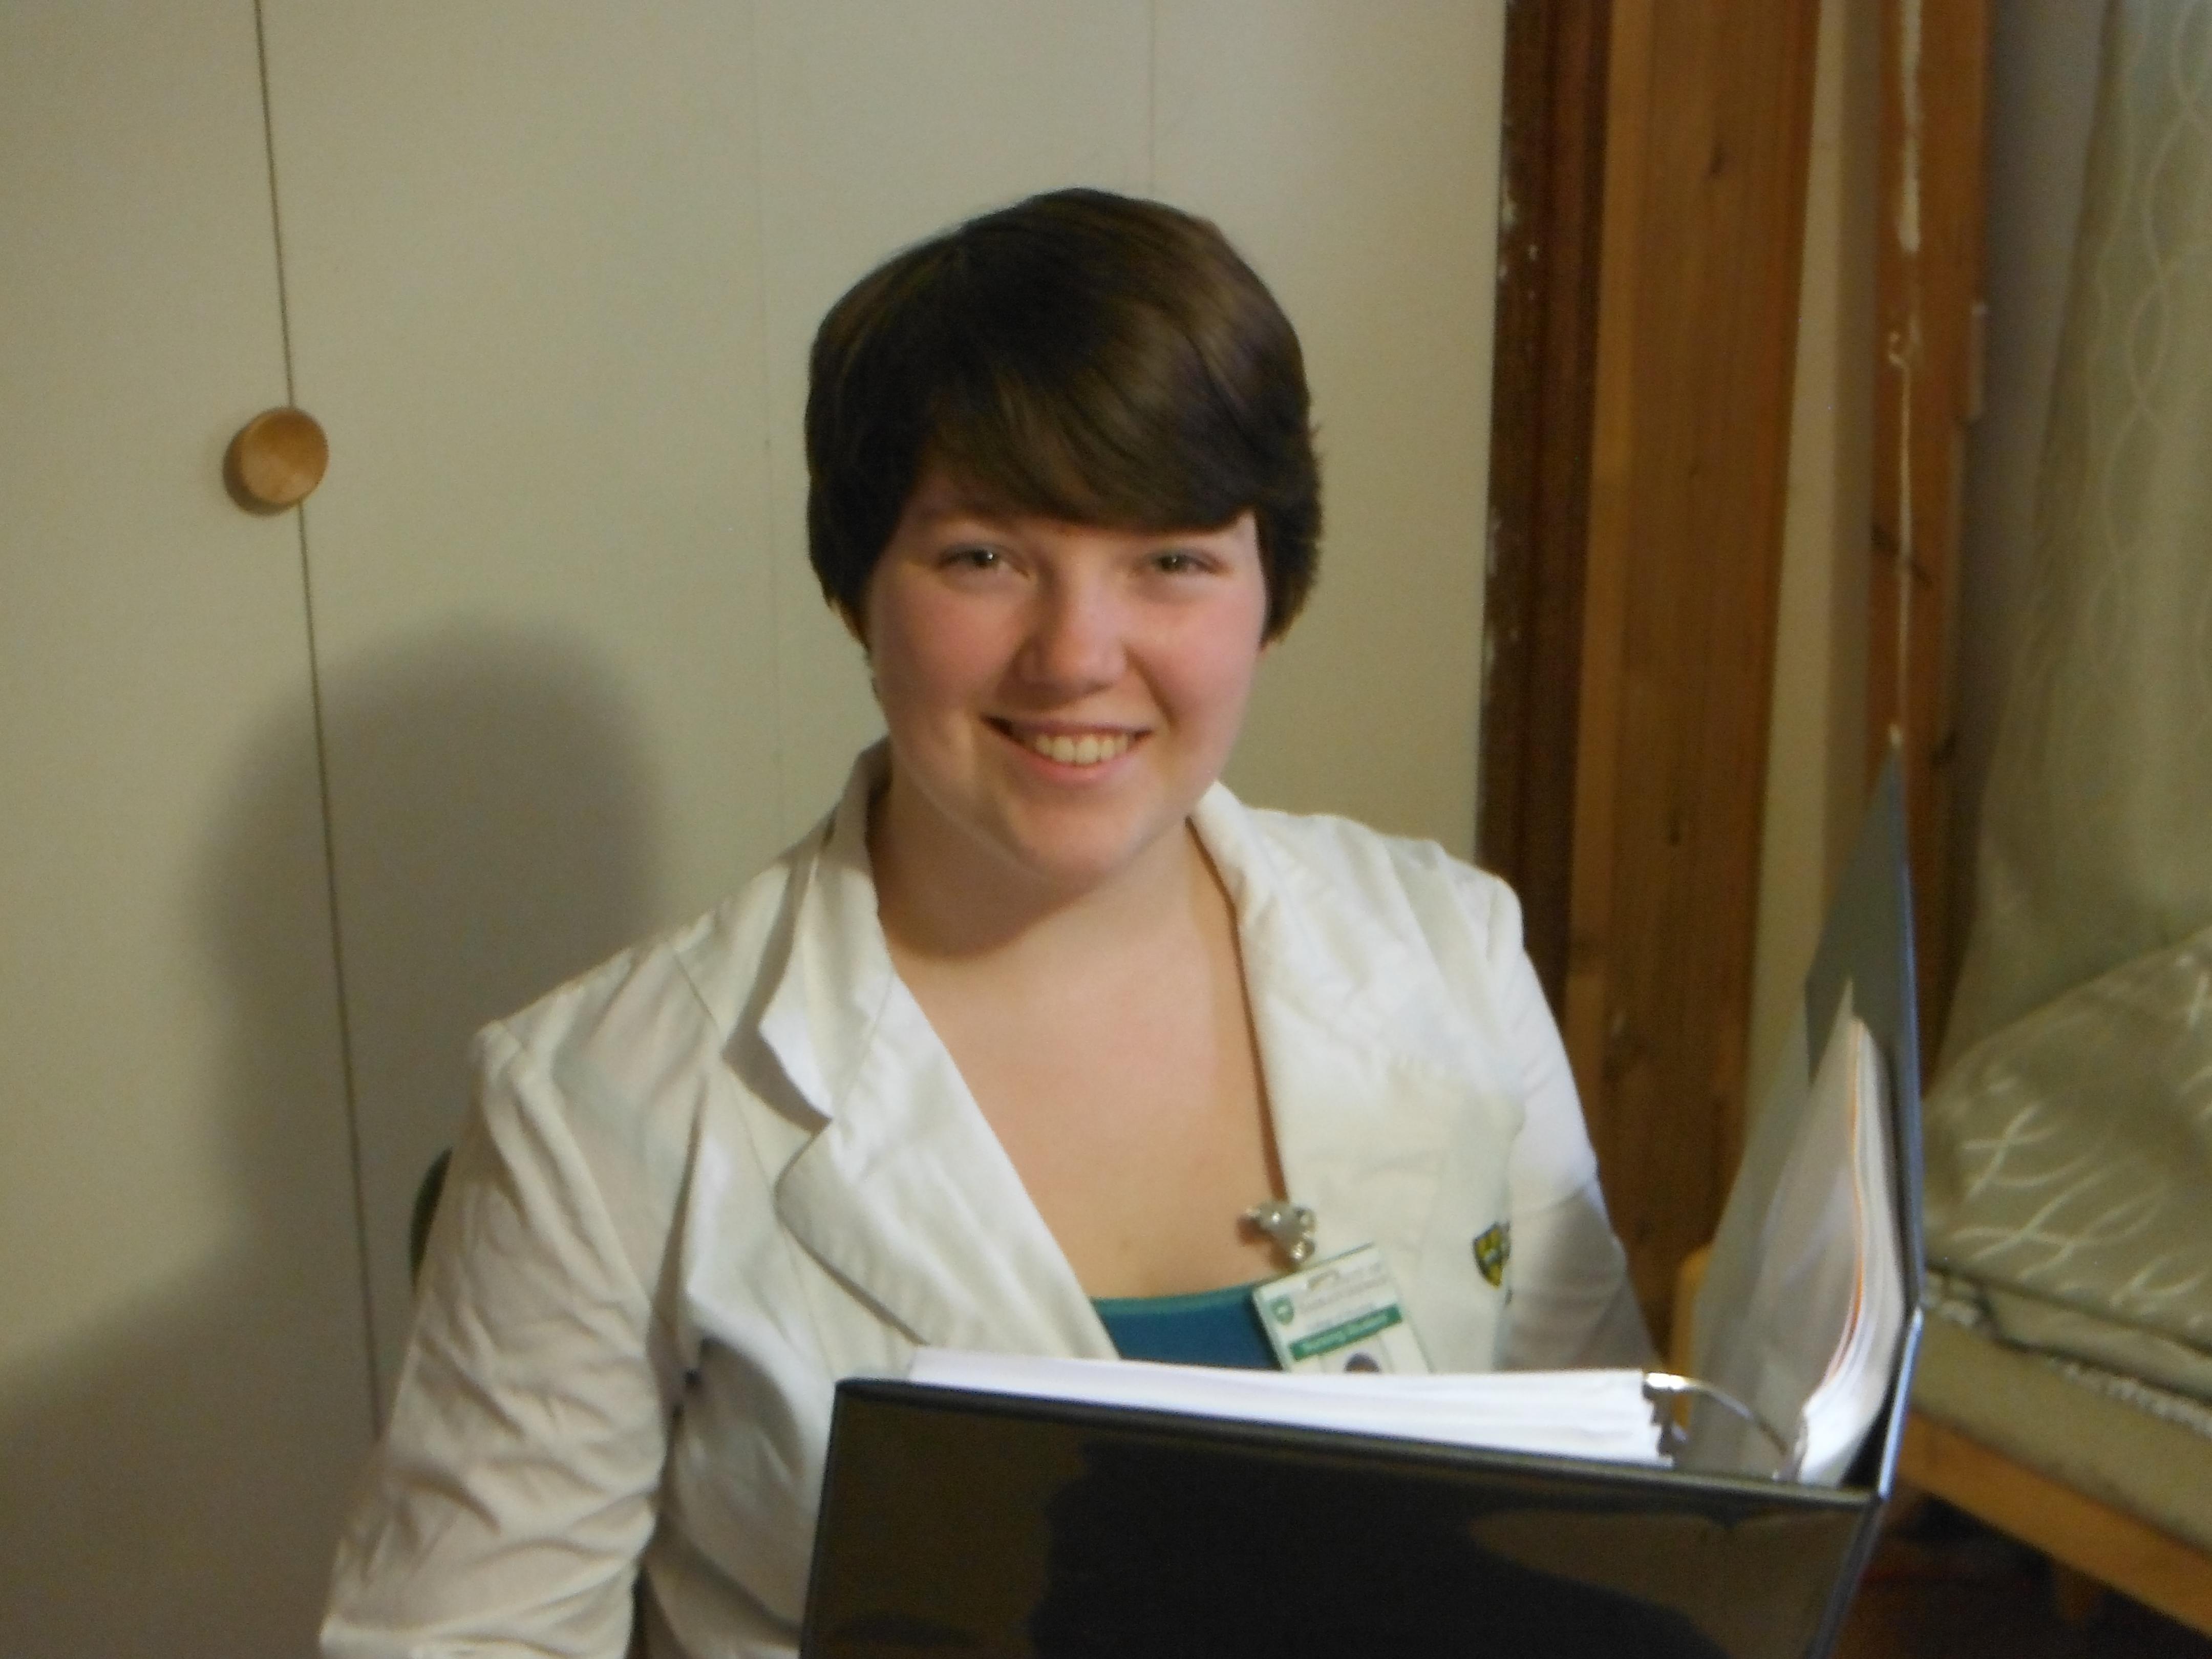 Canadian Nurses Foundation Award